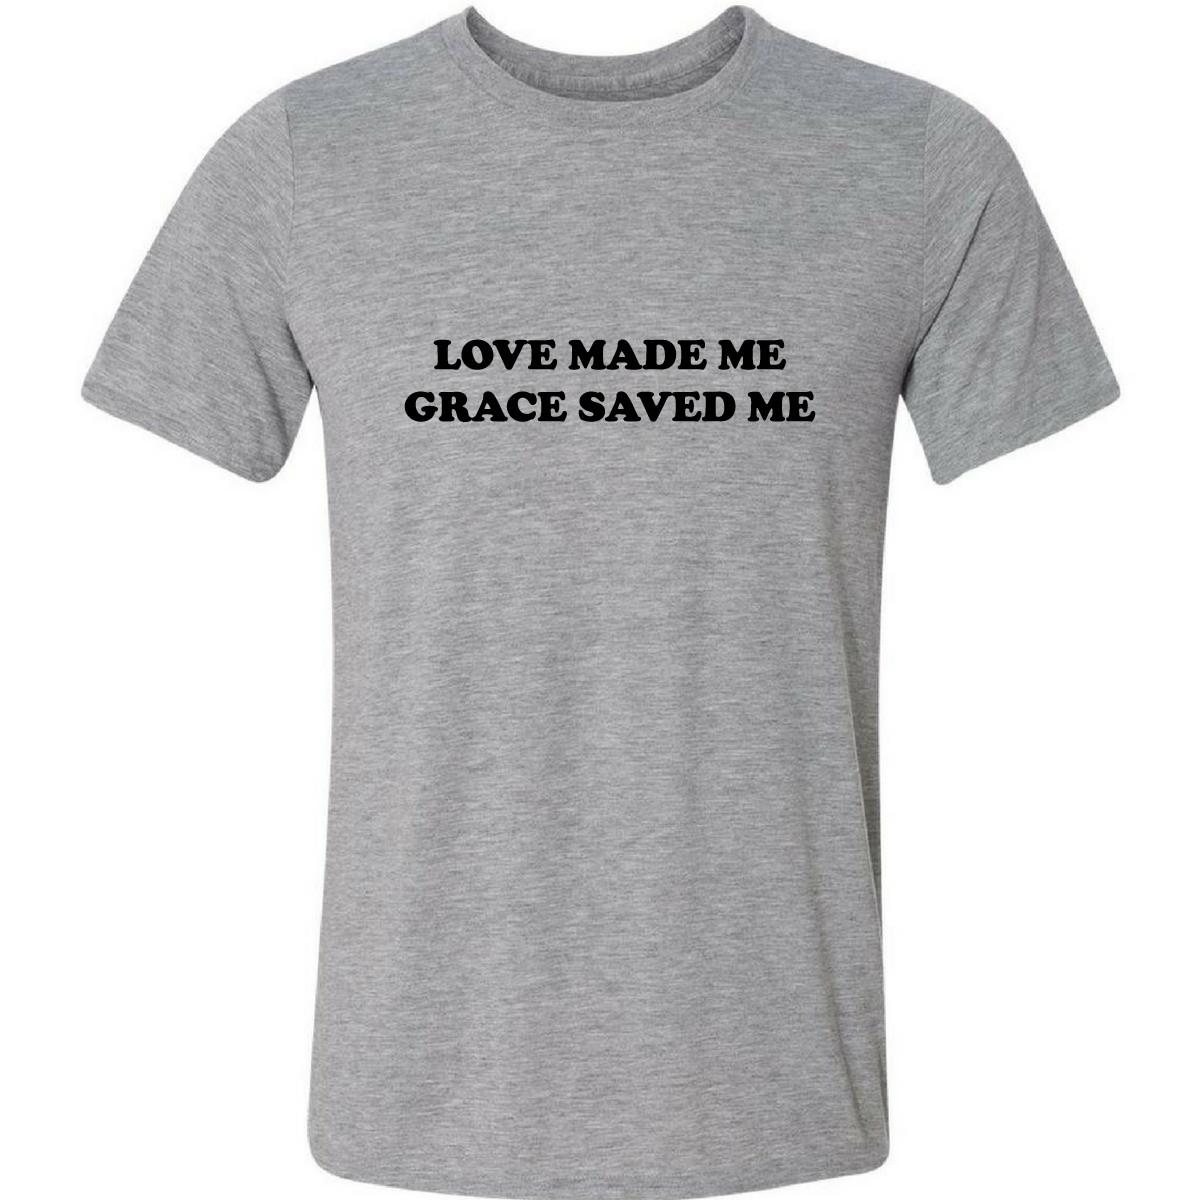 f564c9d6b Camiseta Love Made Me Grace Saved Me Frases Inglês Cristã no Elo7 ...